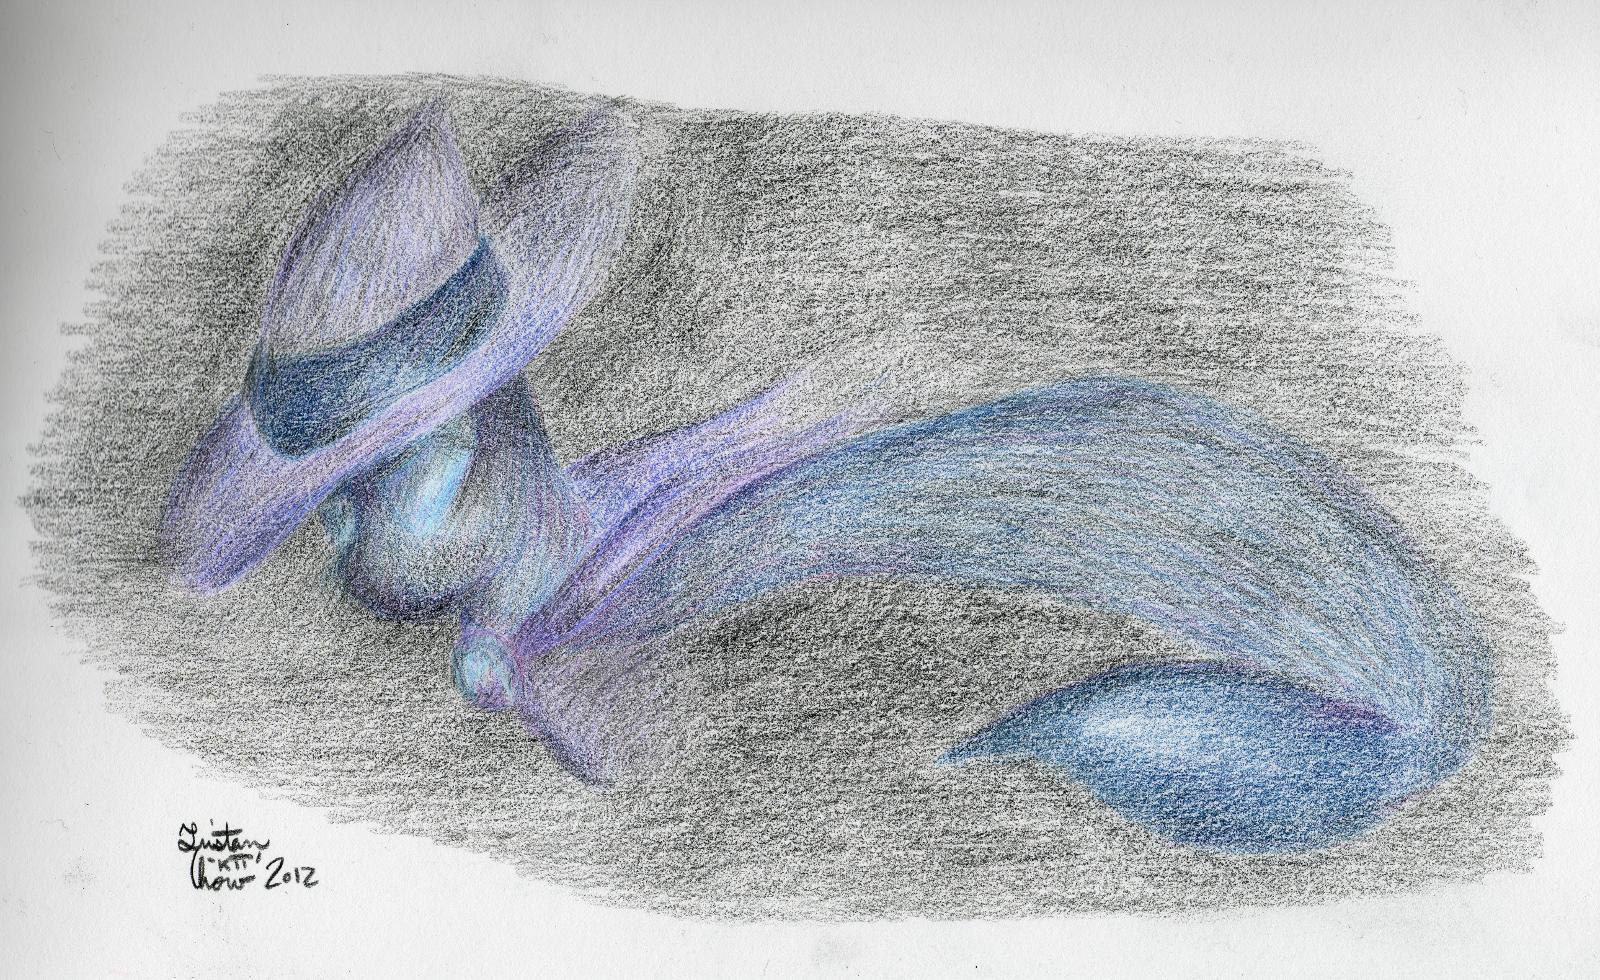 Mysterious Mare Do Well by KuroiTsubasaTenshi